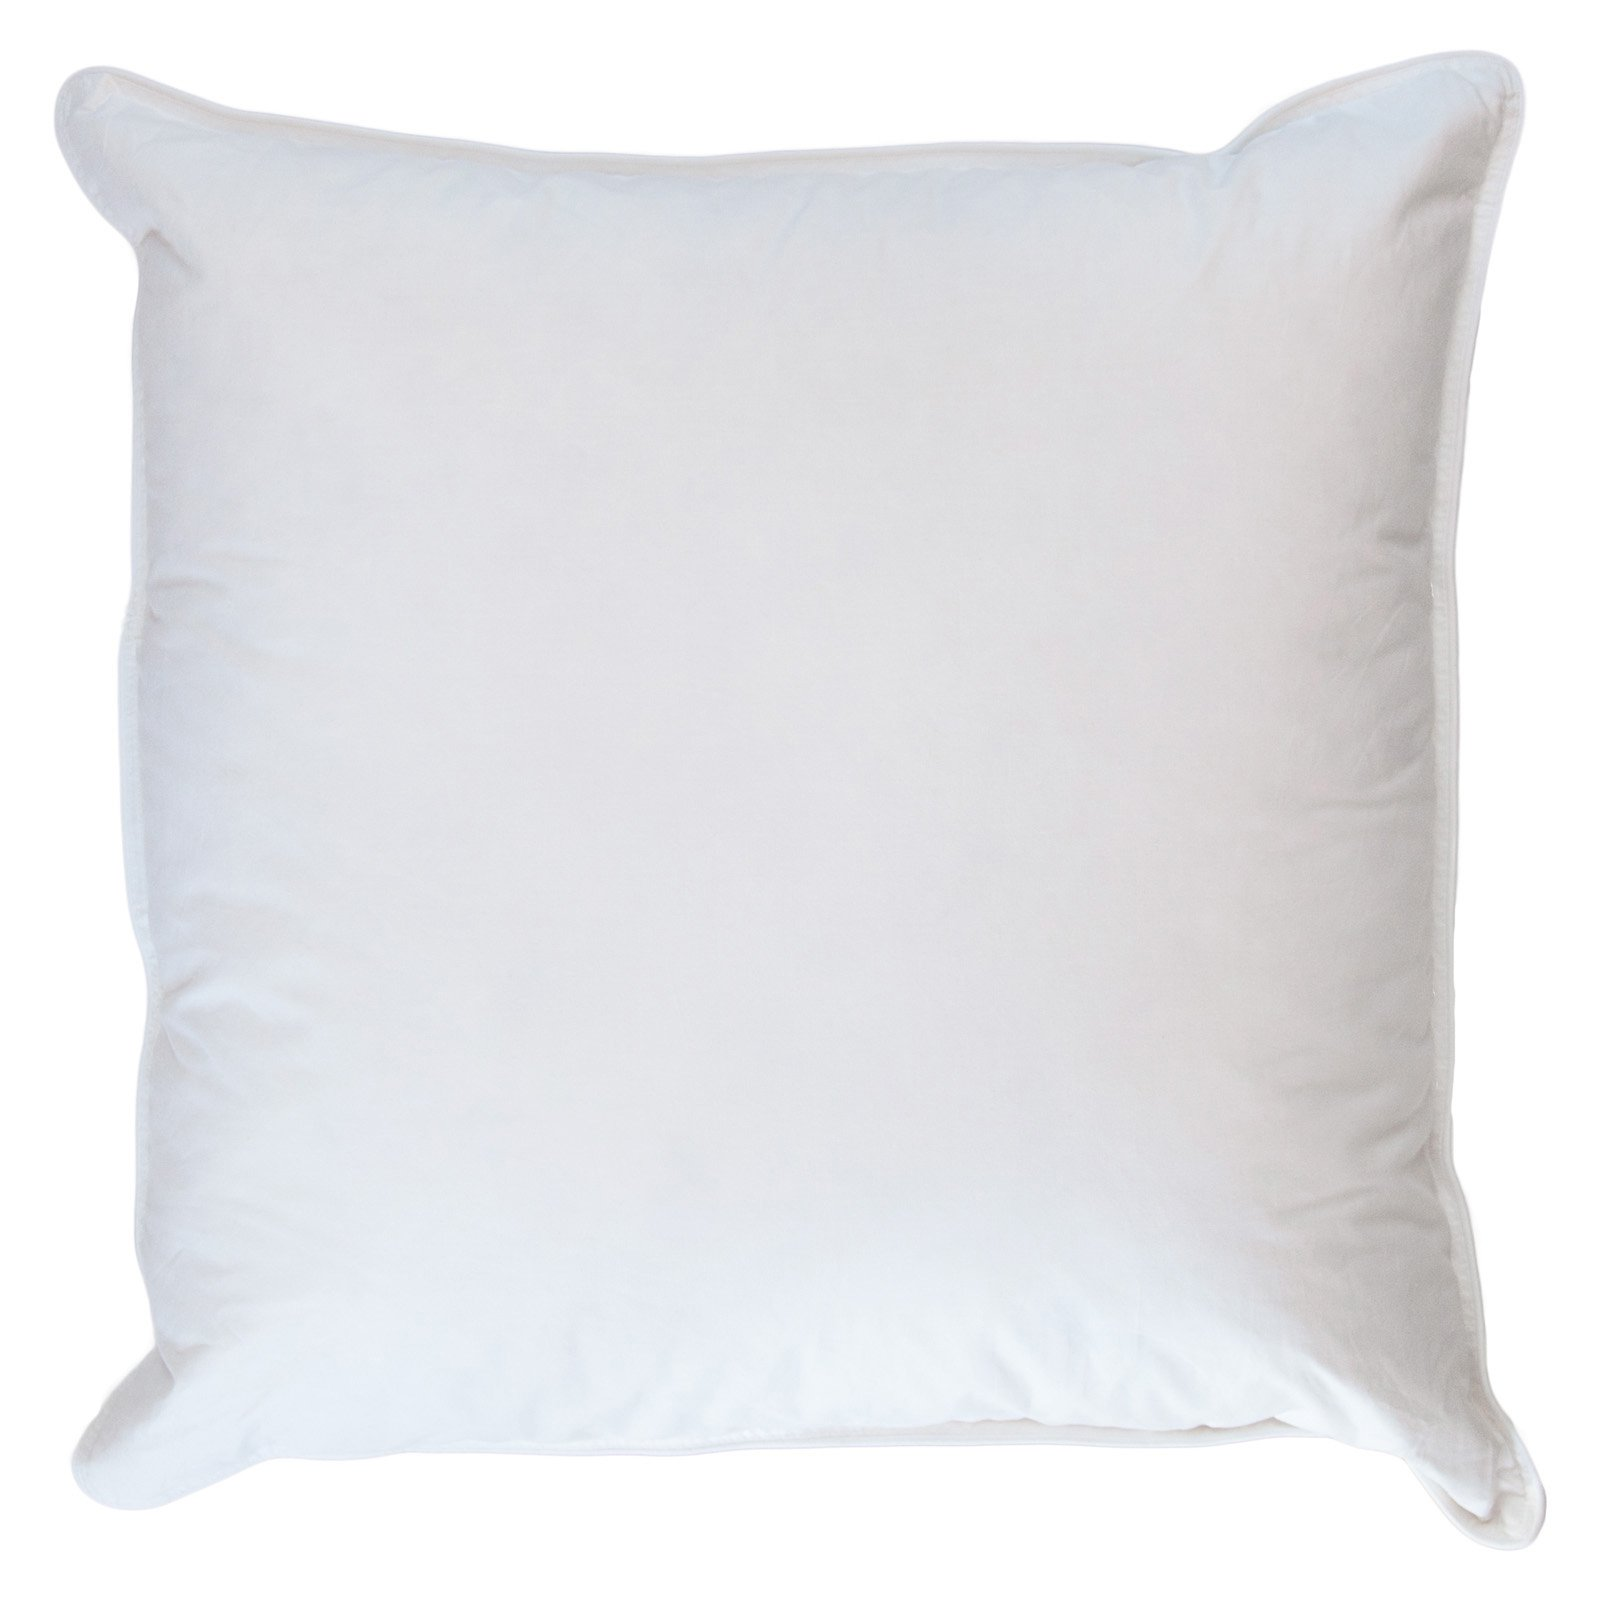 Ogallala Goose Hypodown Throw Pillow Insert